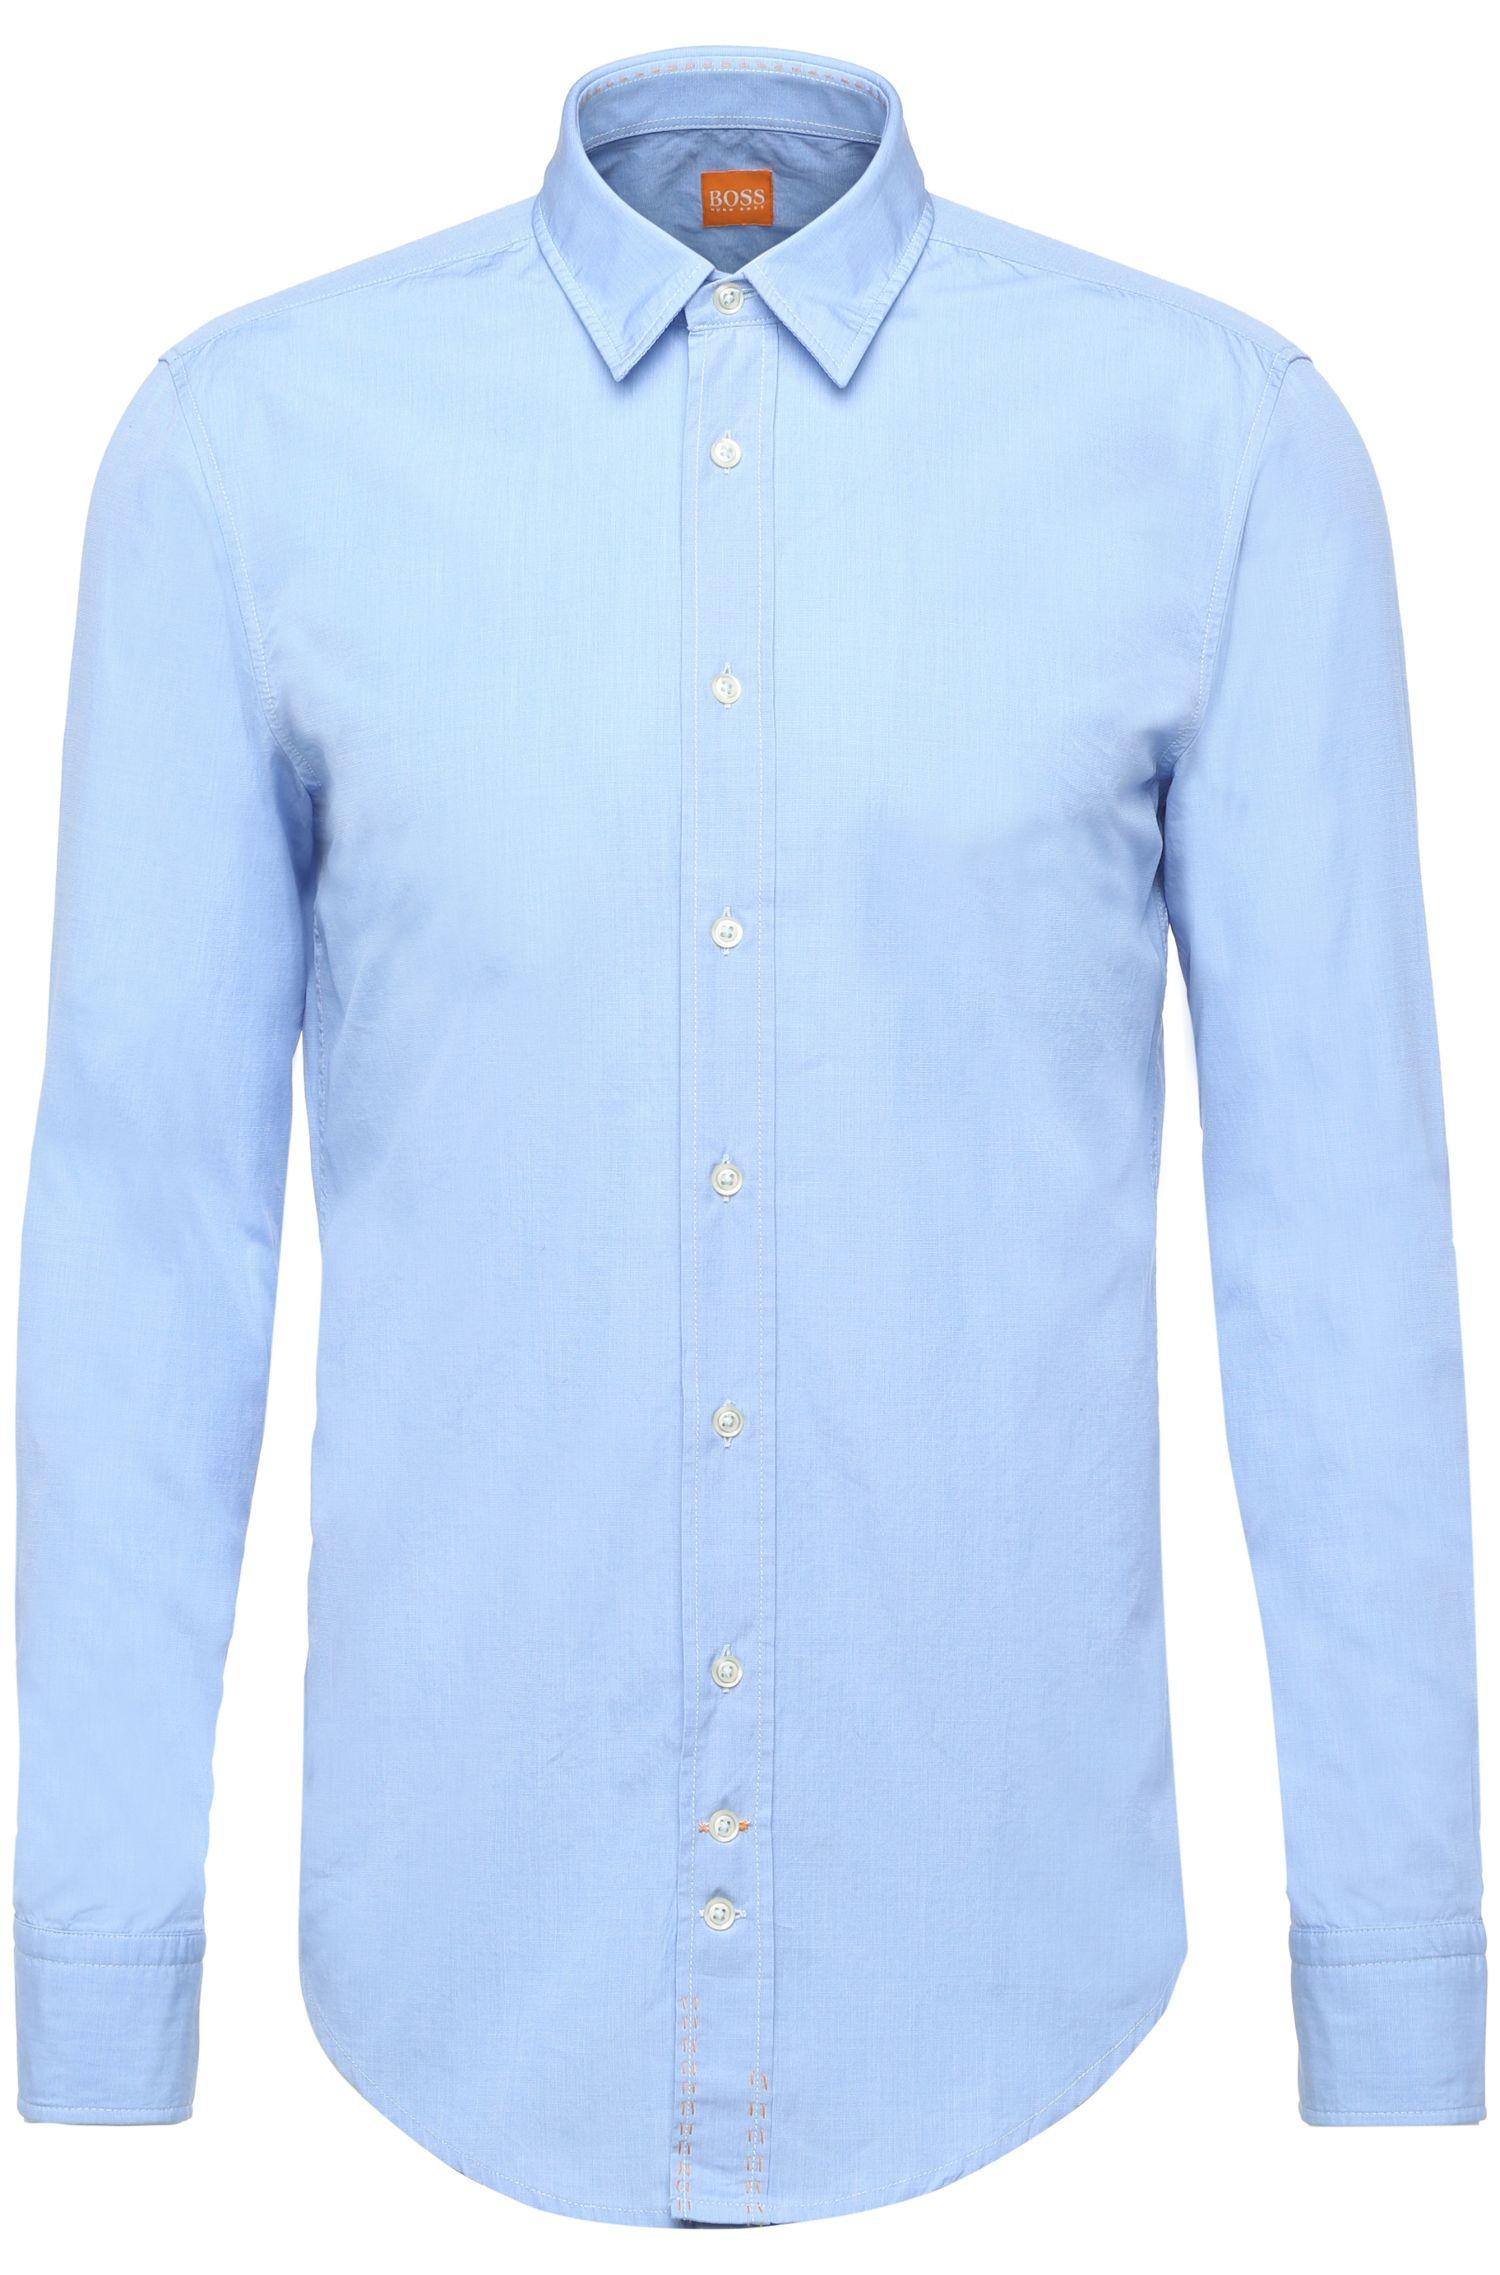 Helles Regular-Fit Hemd aus Baumwolle